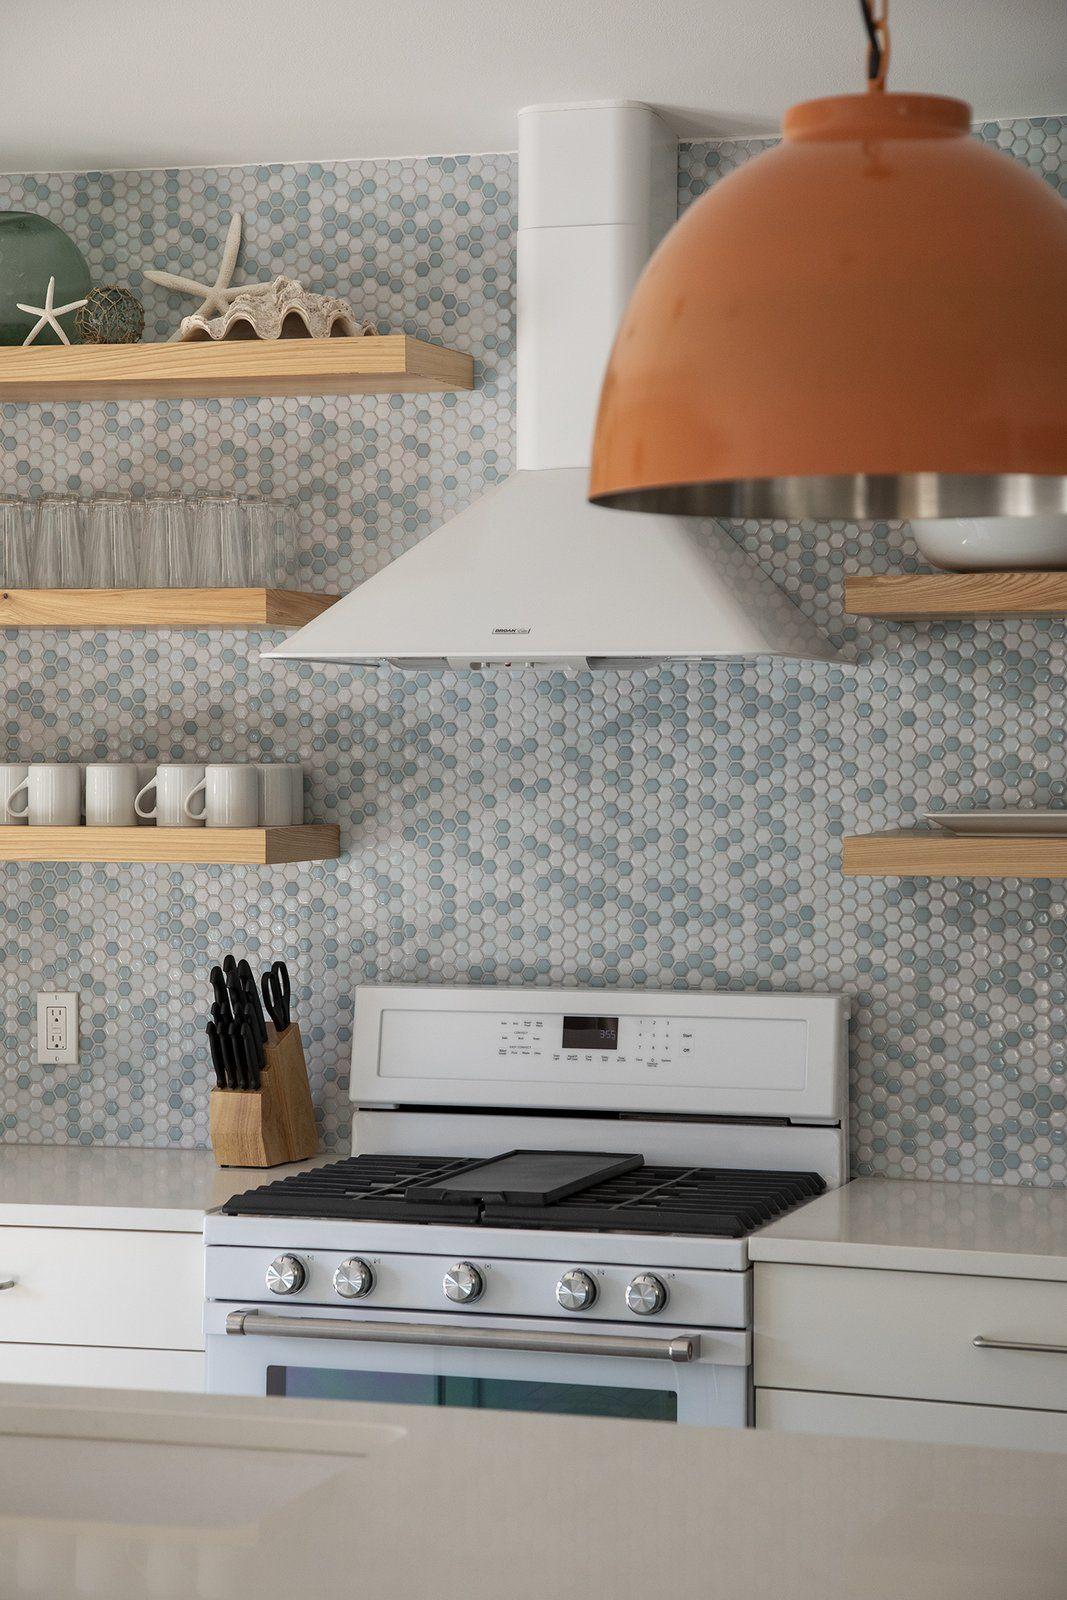 - 50 Kitchen Backsplash Design Ideas - Modern Kitchen Backsplashes